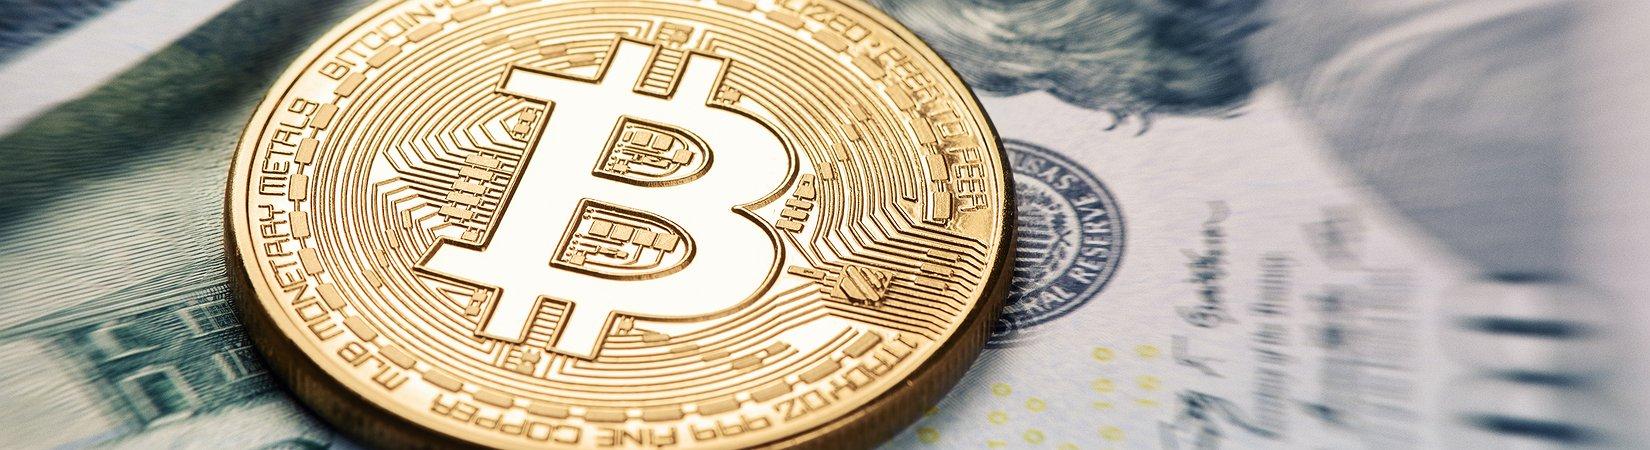 Сколько стоит биткоин на самом деле